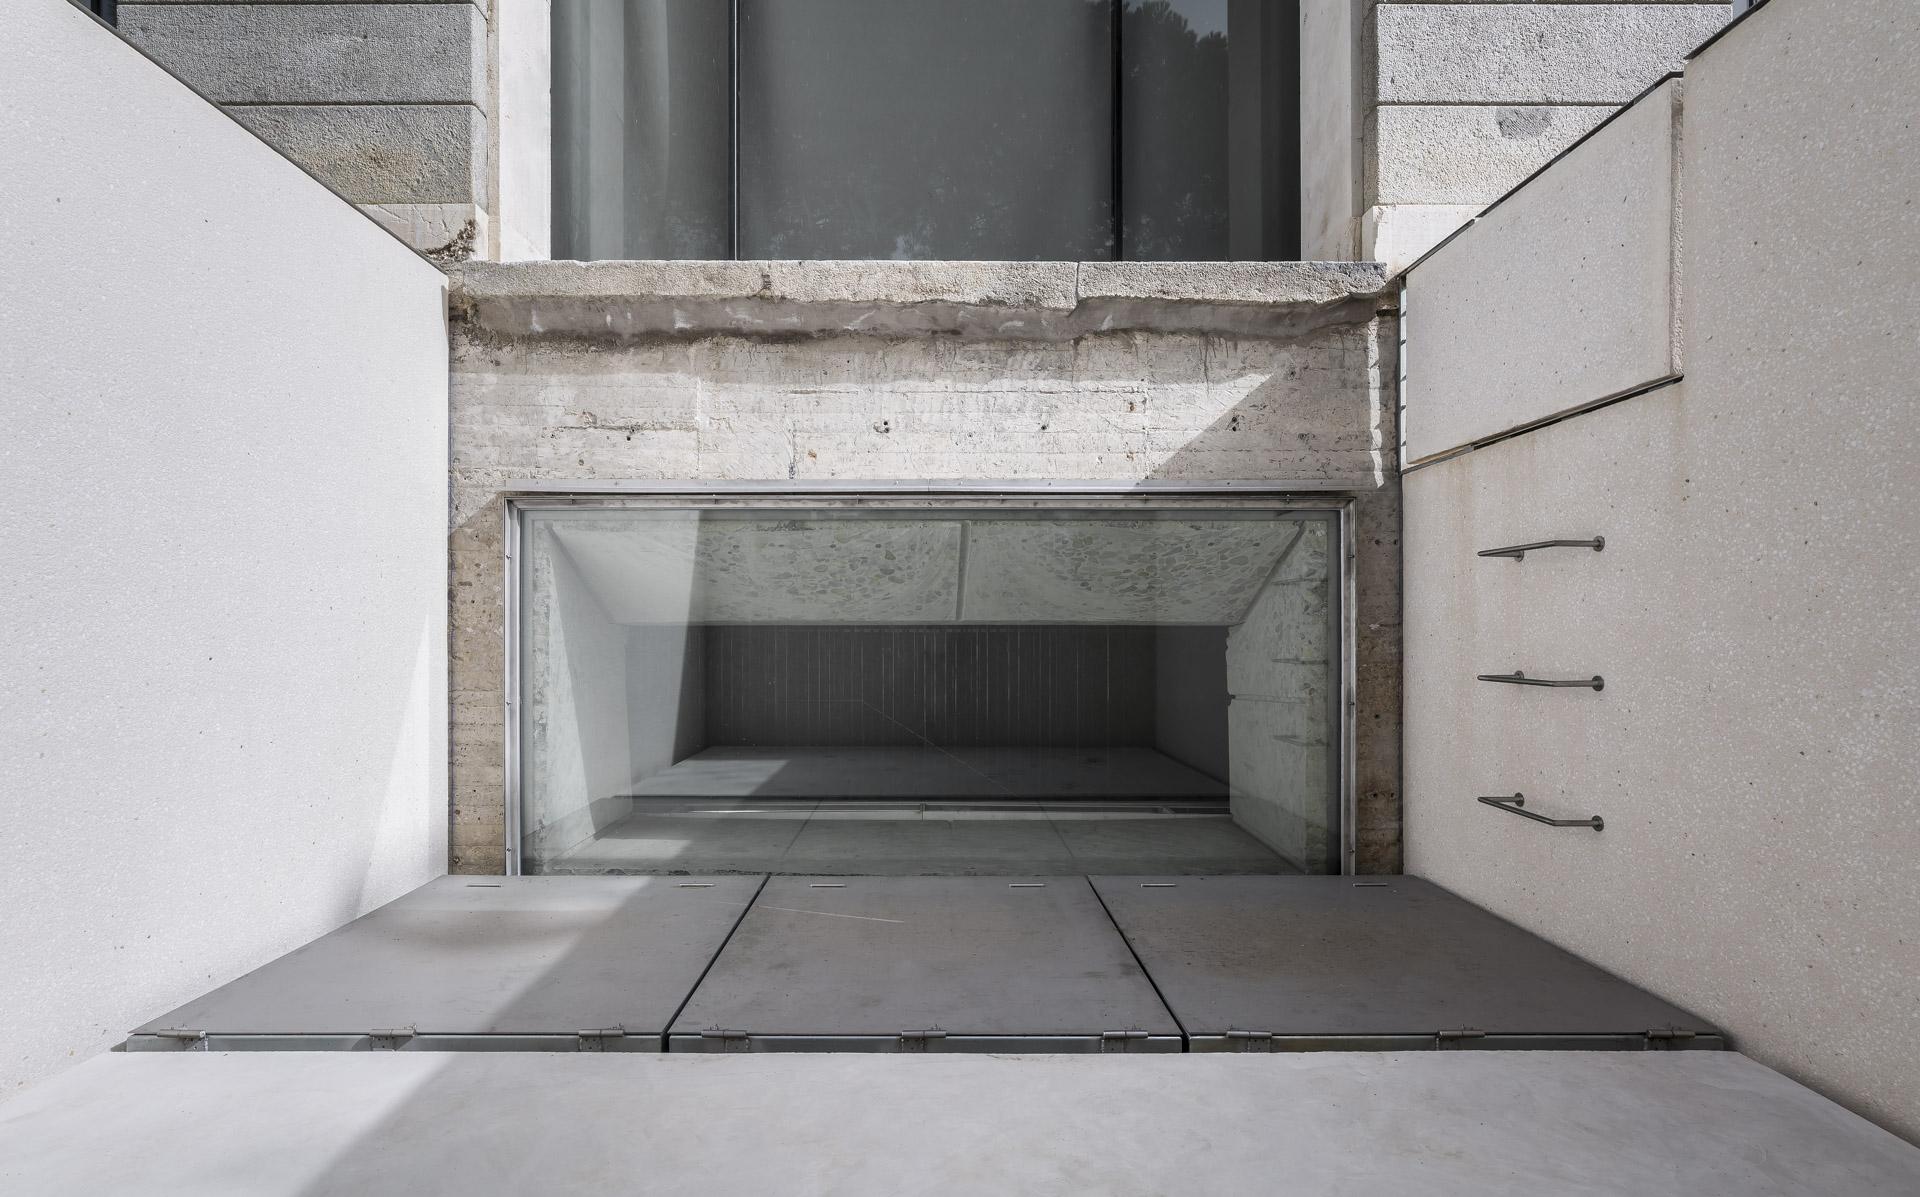 fotografia-arquitectura-madrid-nuevos-ministerios-elorza-german-cabo-08